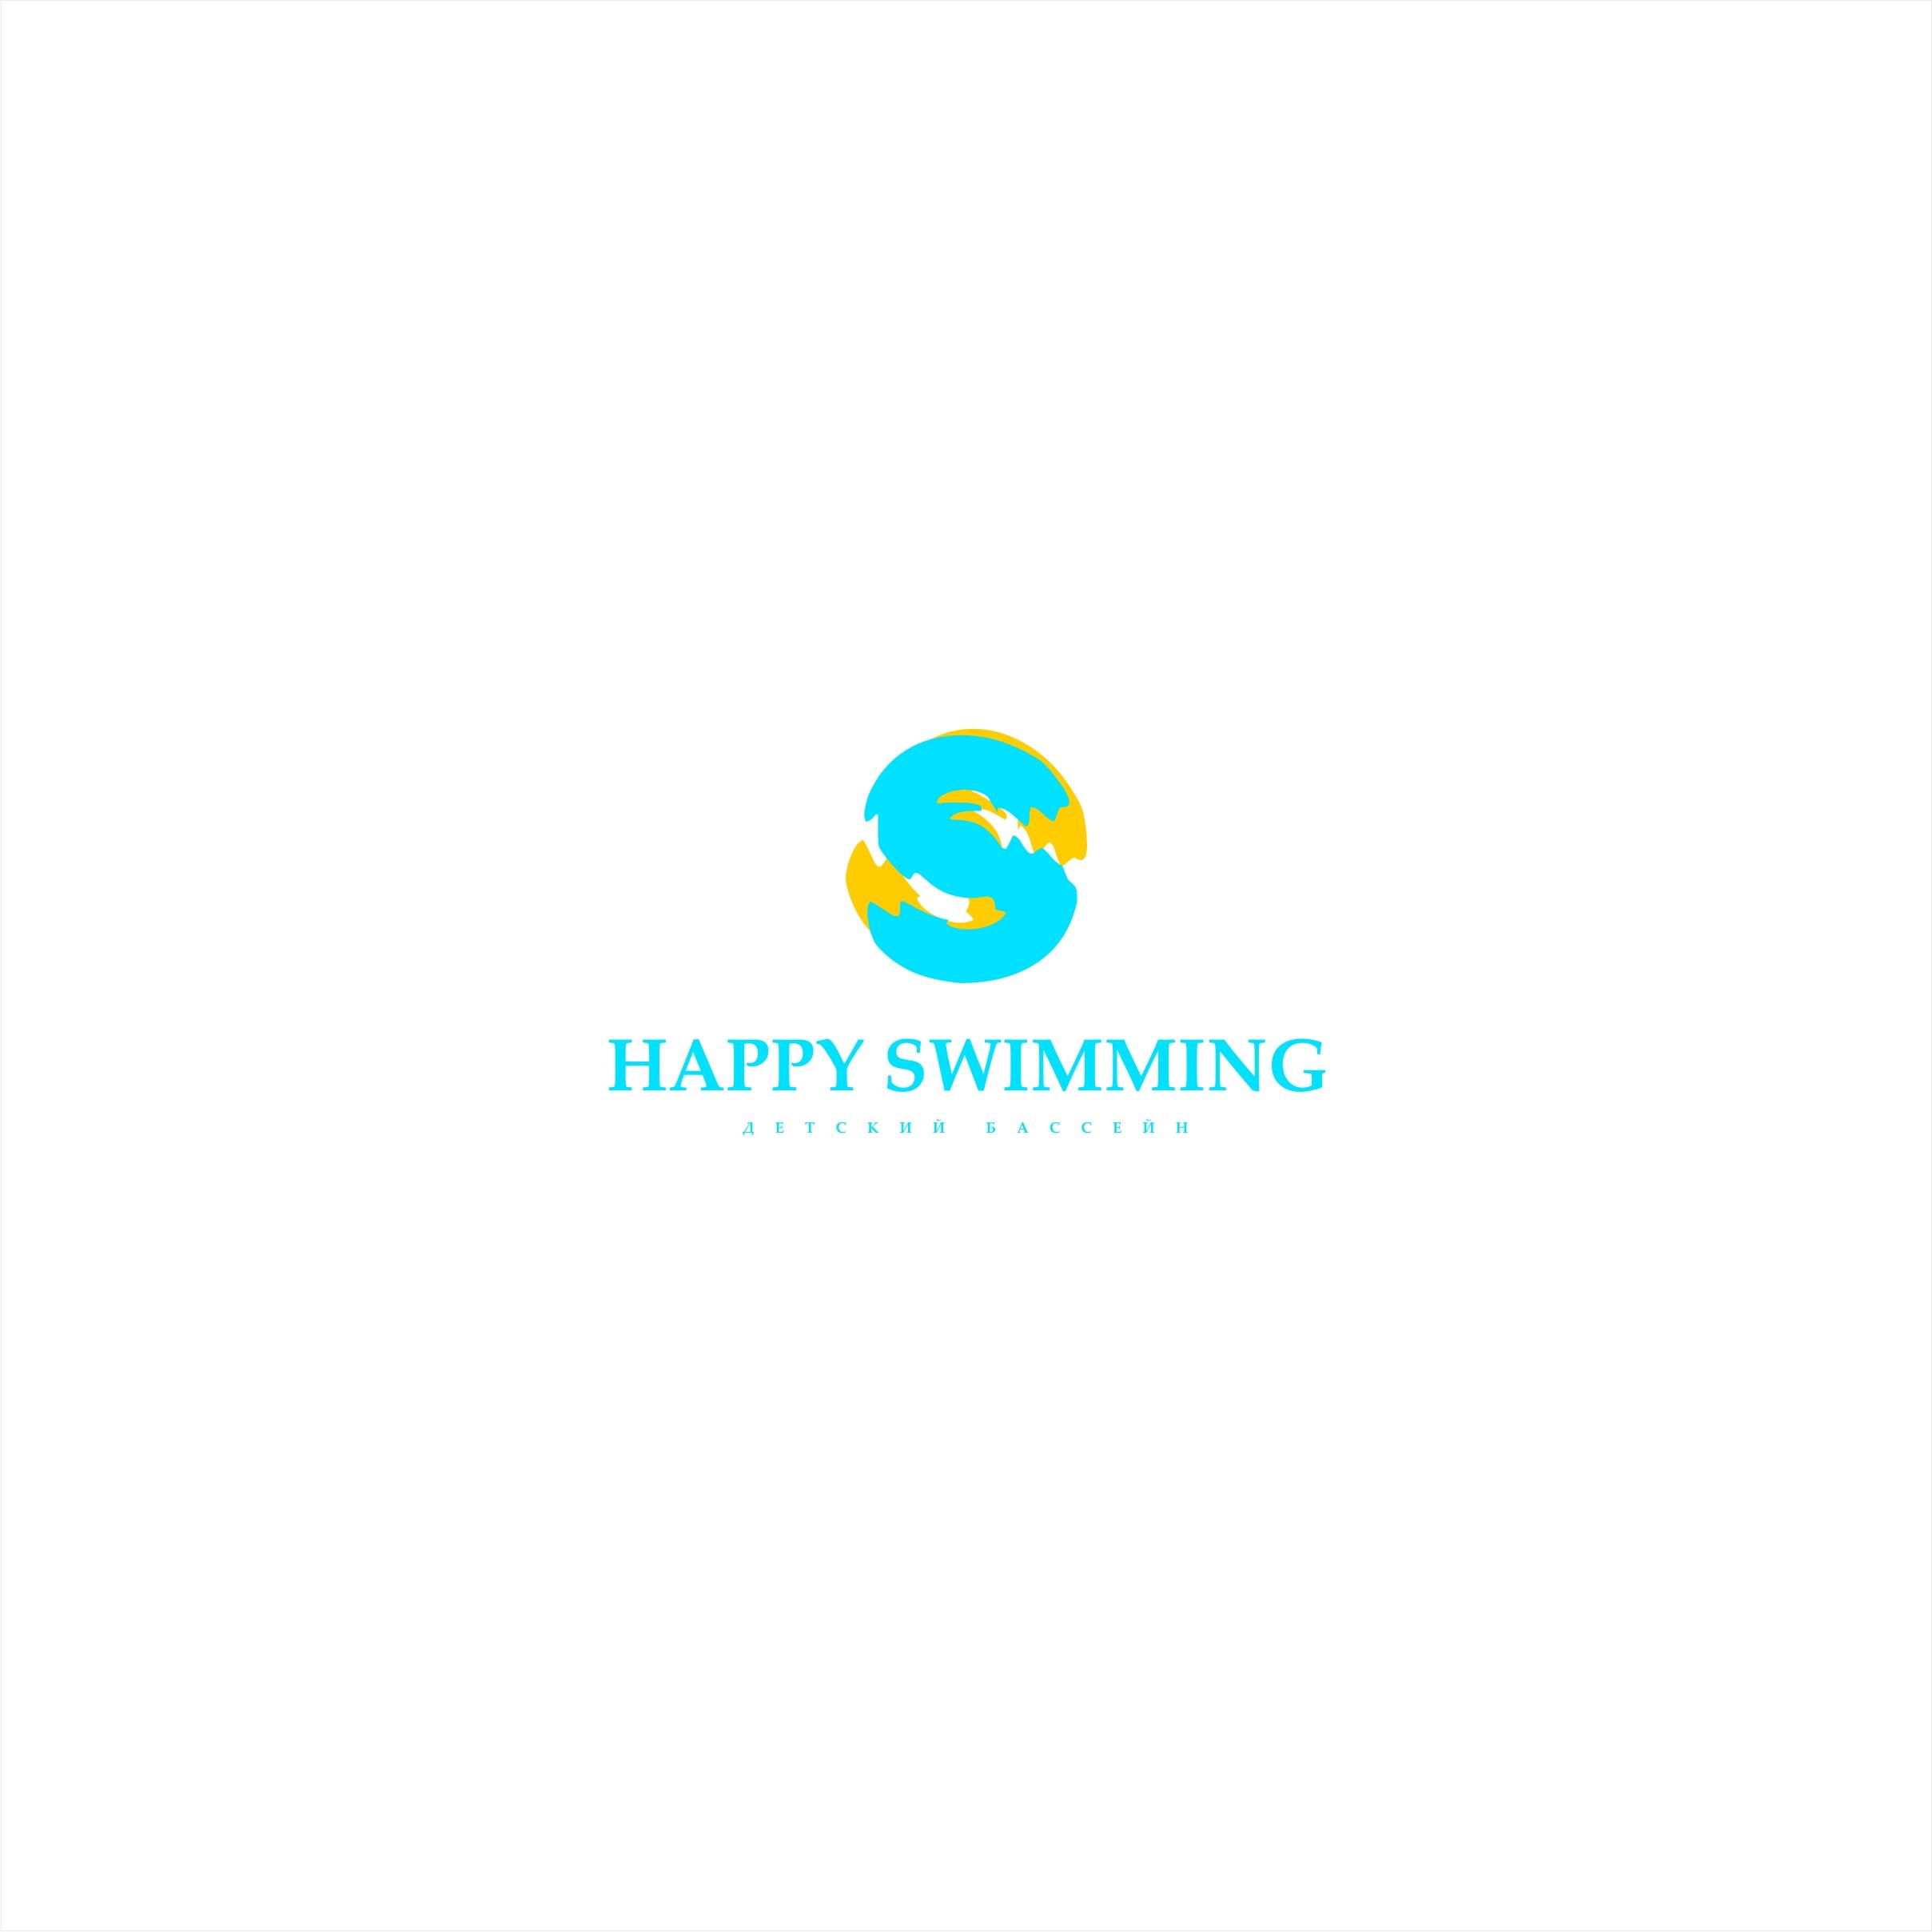 Логотип для  детского бассейна. фото f_4795c73bf2183a15.jpg